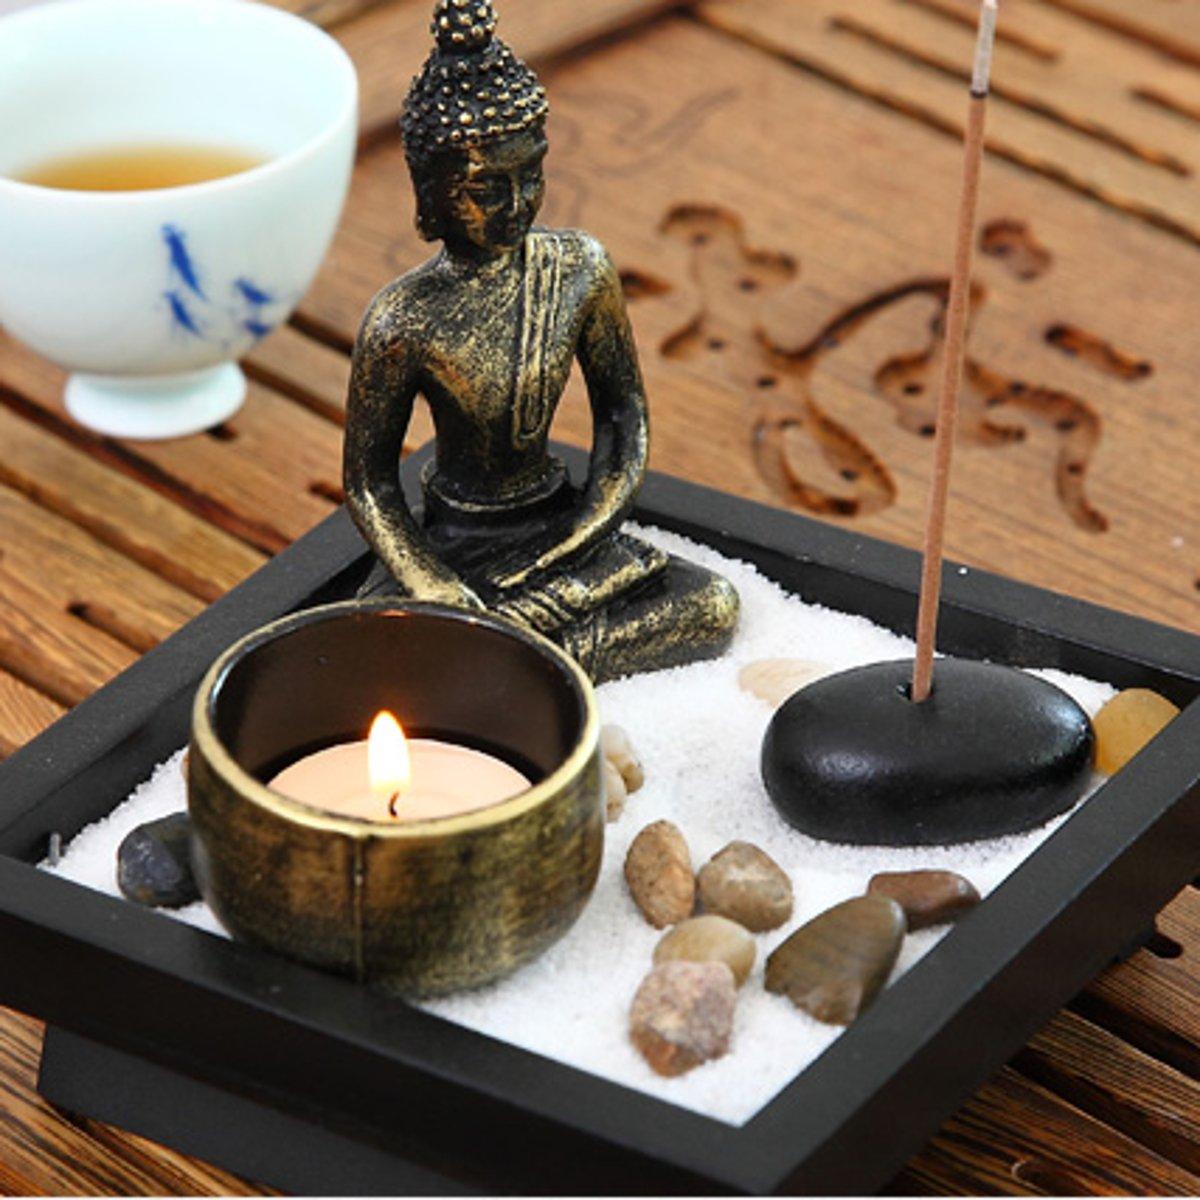 Jeteven Buddha -Statue Sitzend Chinesische Art Zen-Garten Harz Kerzenleuchter-Set Kerzenständer Teelichthalter Kerzenhalter (Buddha)